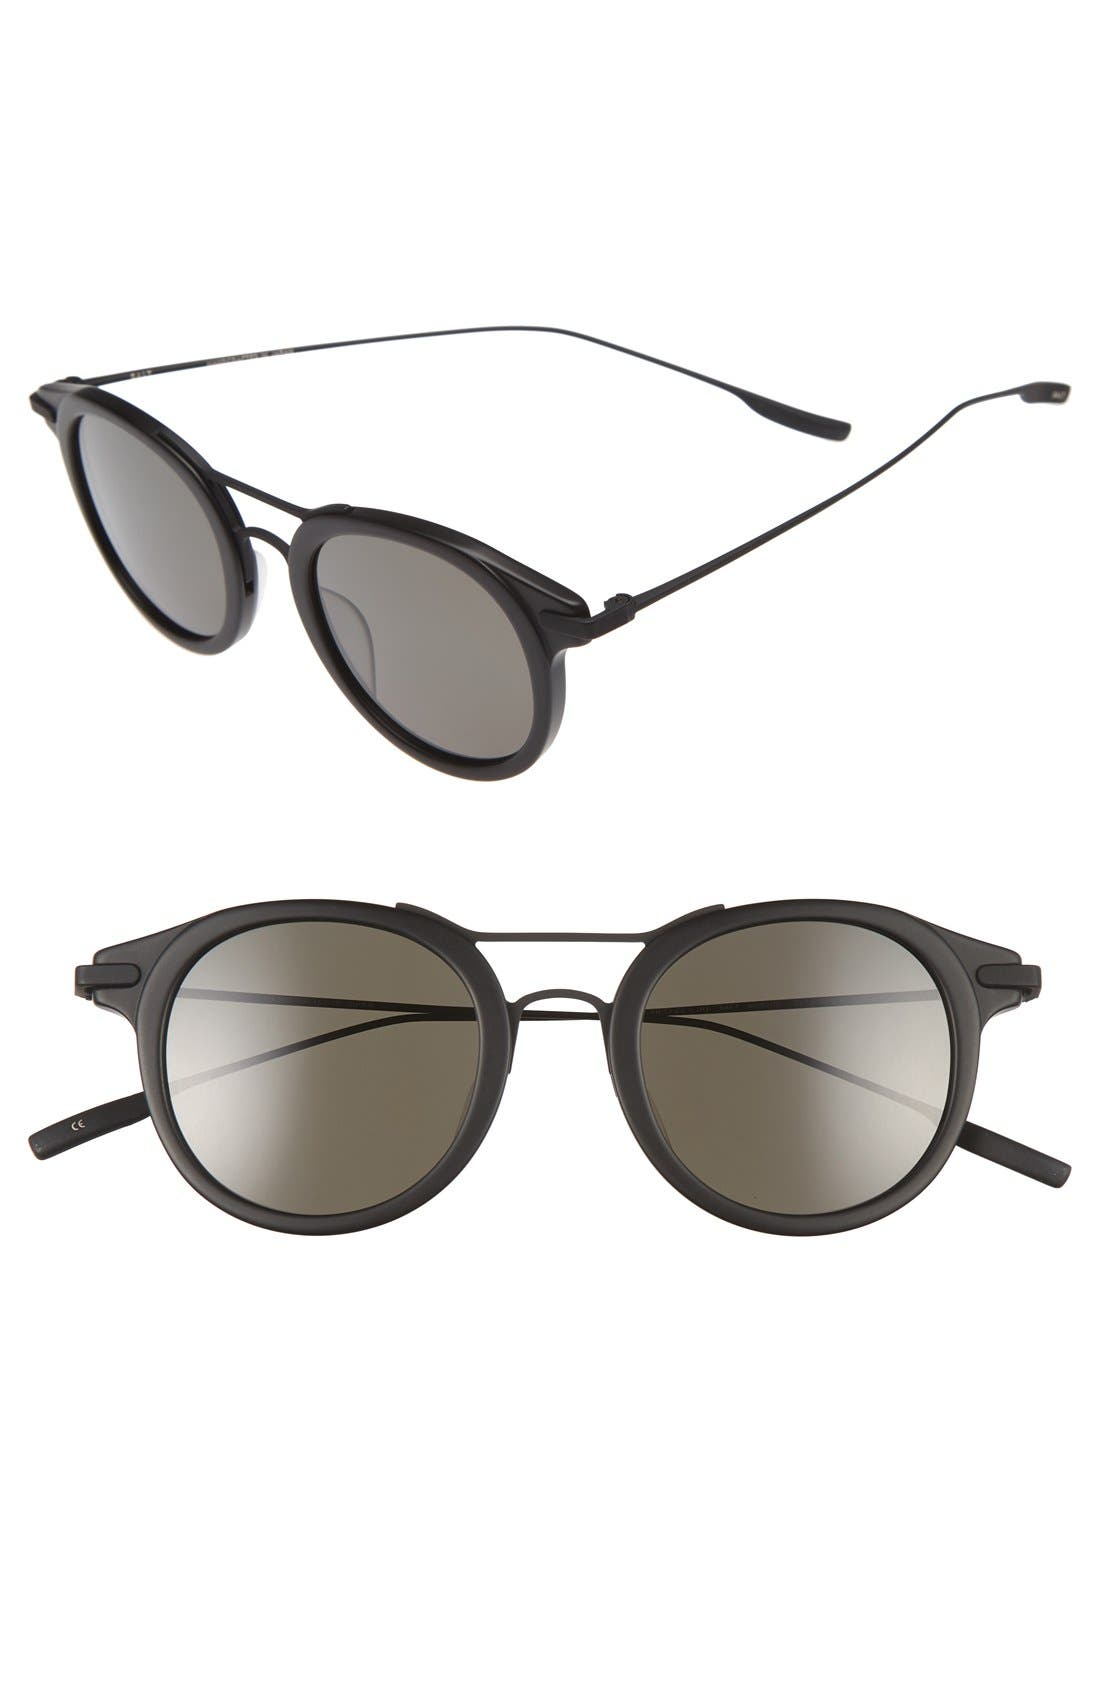 Taft 46mm Polarized Round Sunglasses,                             Alternate thumbnail 2, color,                             Matte Black/ Black Sand